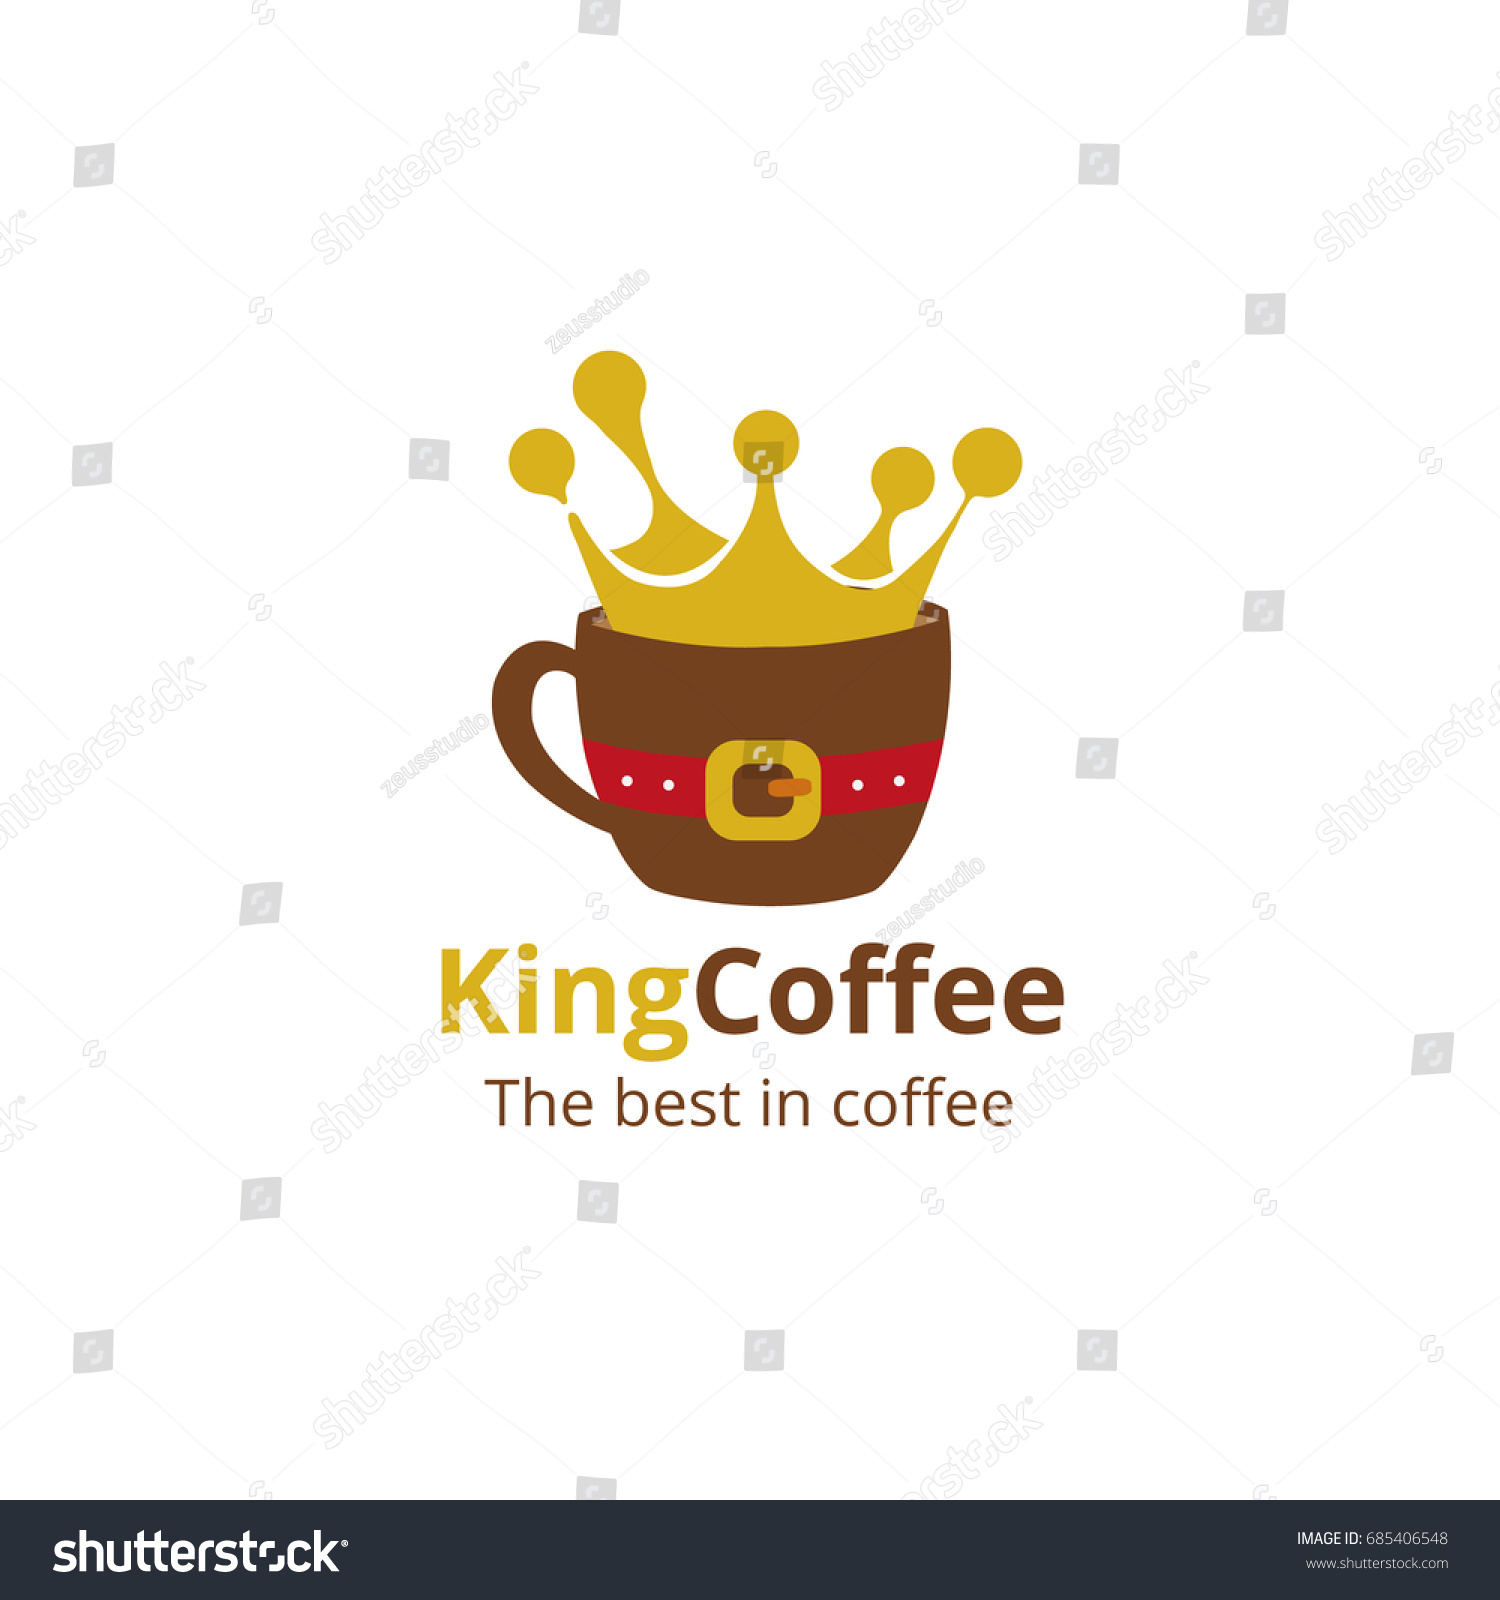 image shutterstock com/z/stock-vector-coffee-shop-